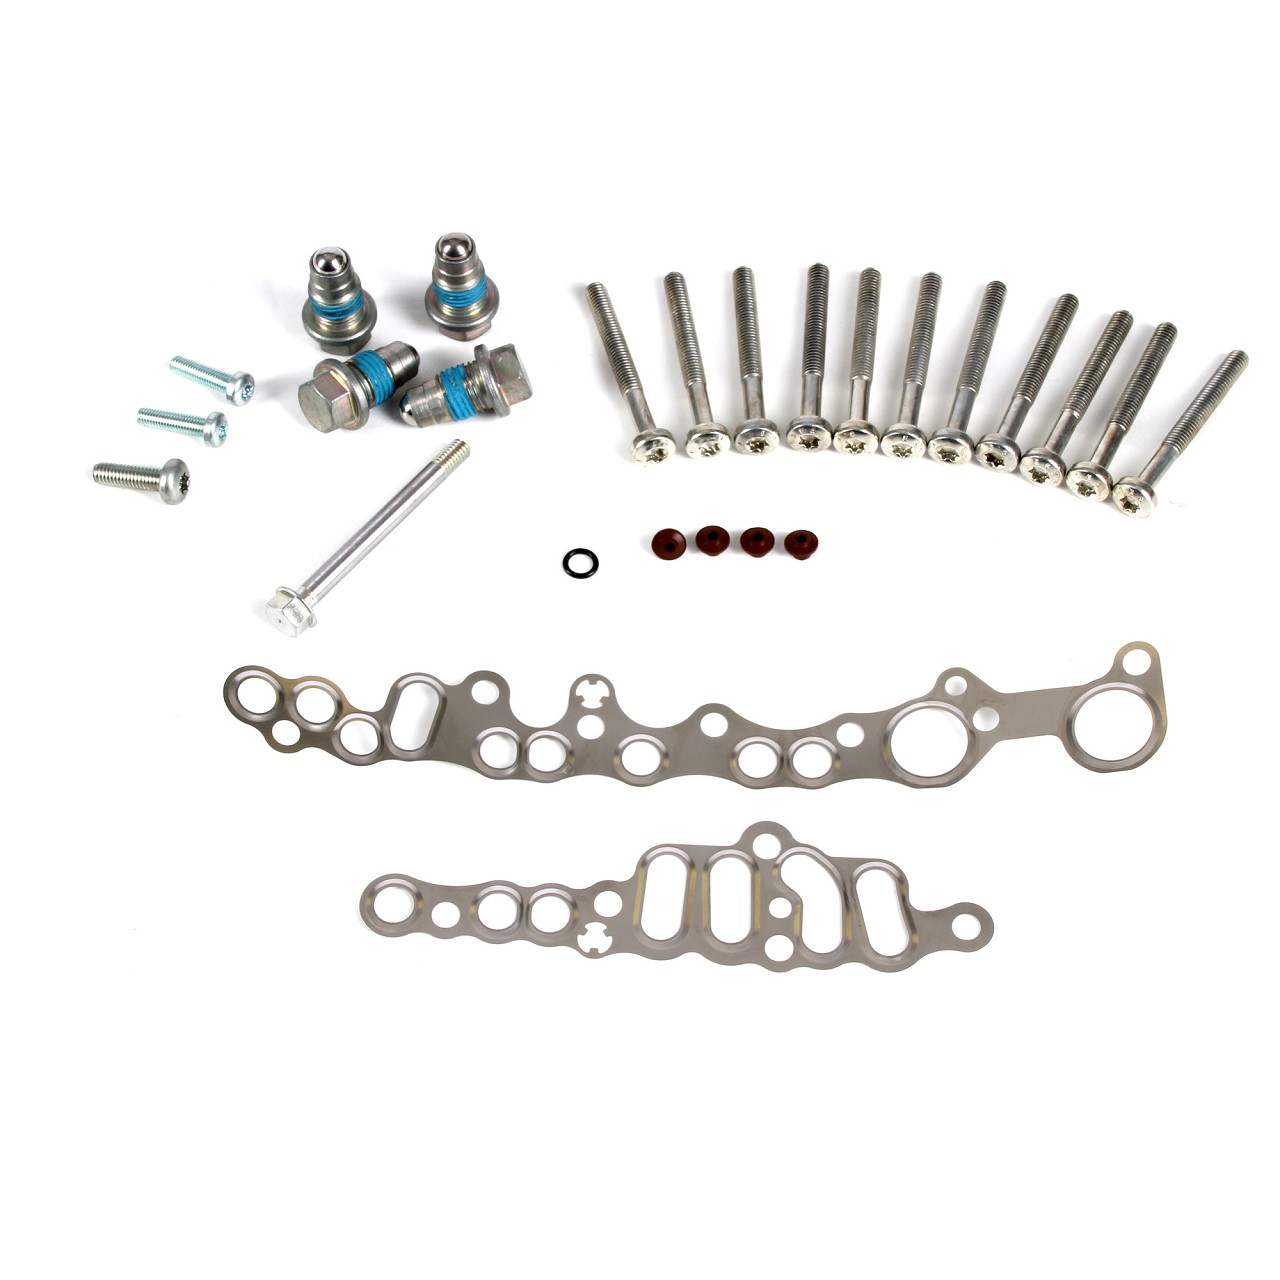 ORIGINAL Ford Hydraulikfilter Satz C-MAX FOCUS GALAXY KUGA MONDEO S-MAX 1848704